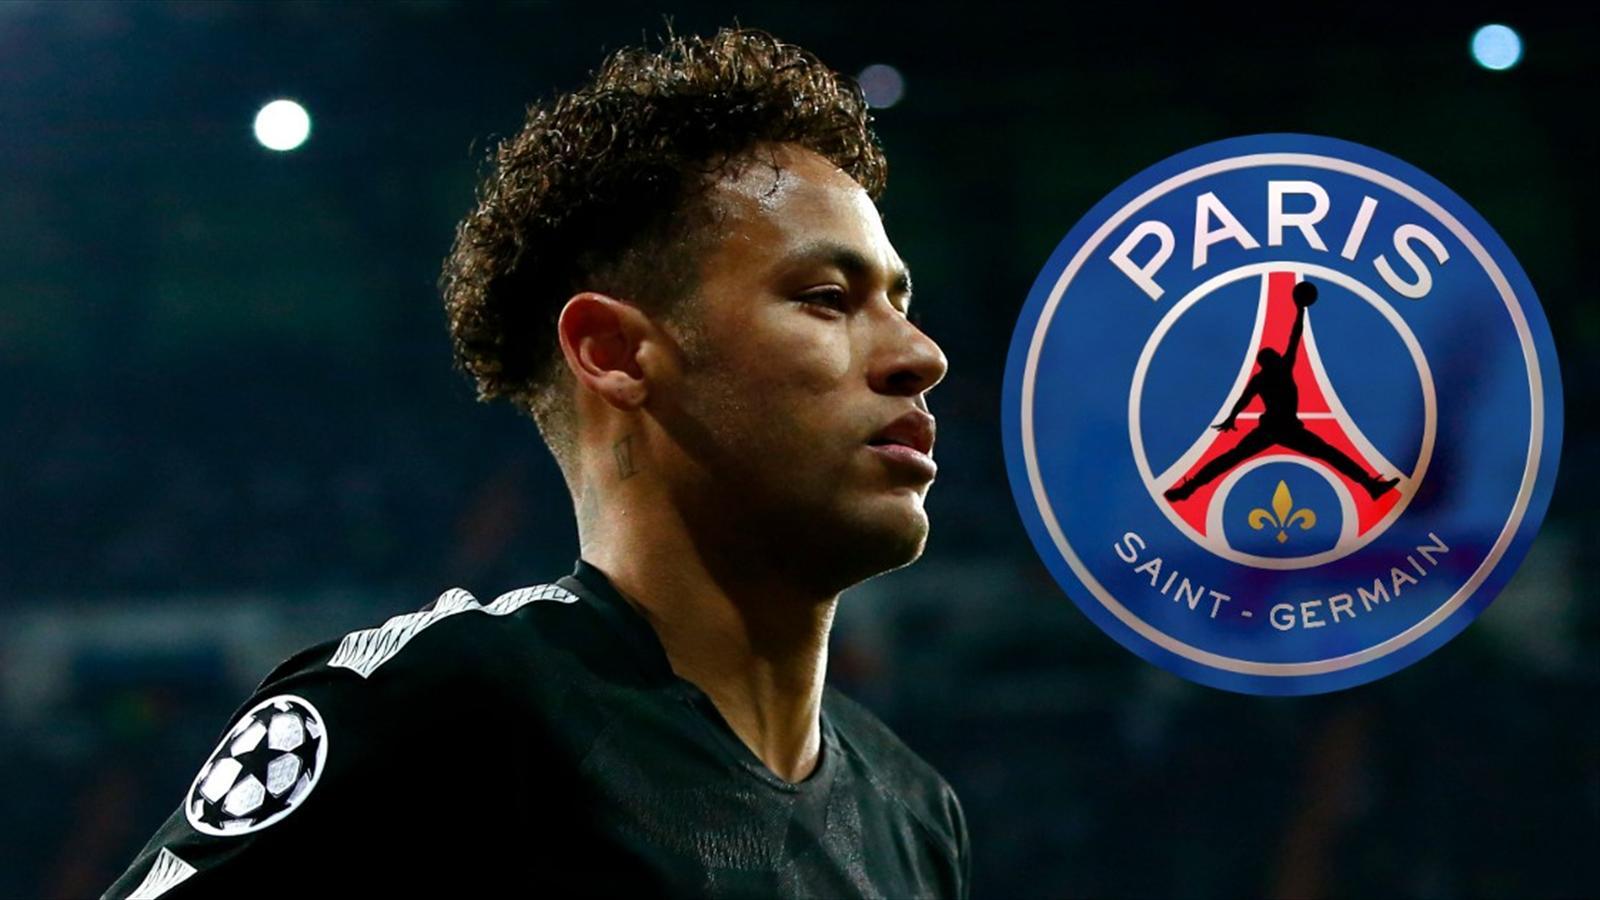 f4f8be4dbf9 Le PSG portera des maillots Jordan en Ligue des champions - Ligue des  champions 2018-2019 - Football - Eurosport